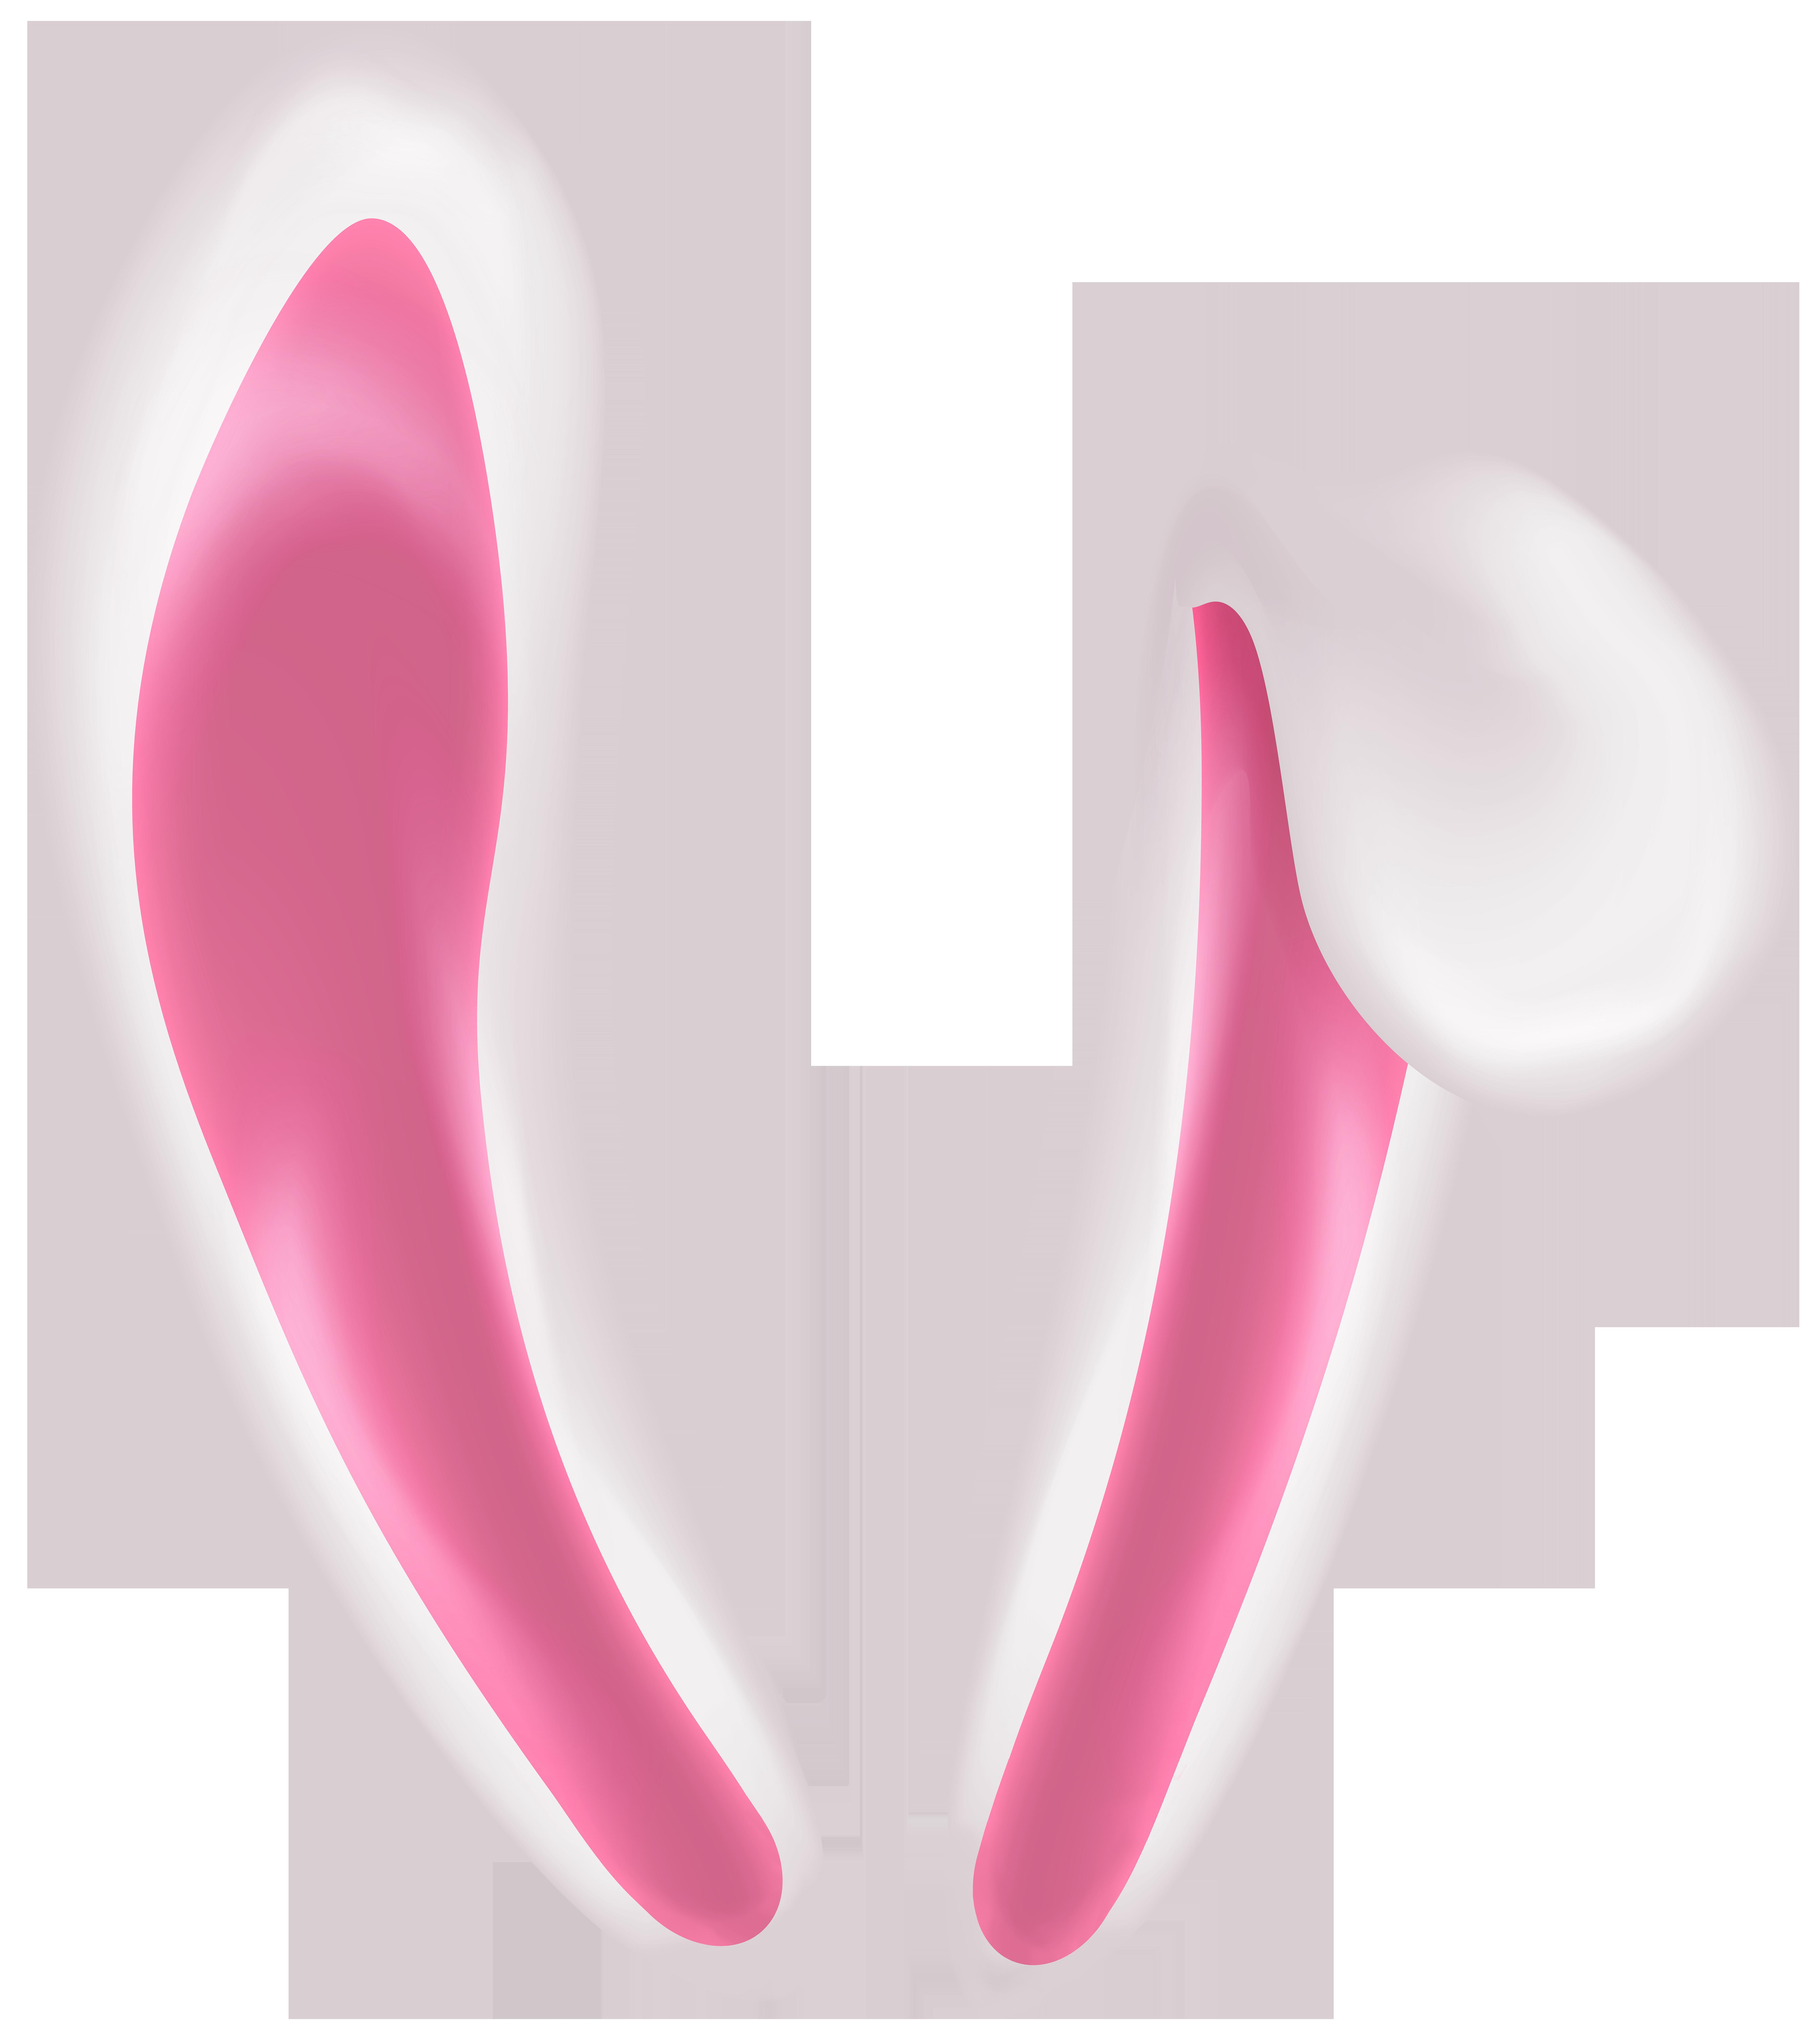 Bunny Ears Transparent Clip Art Image.